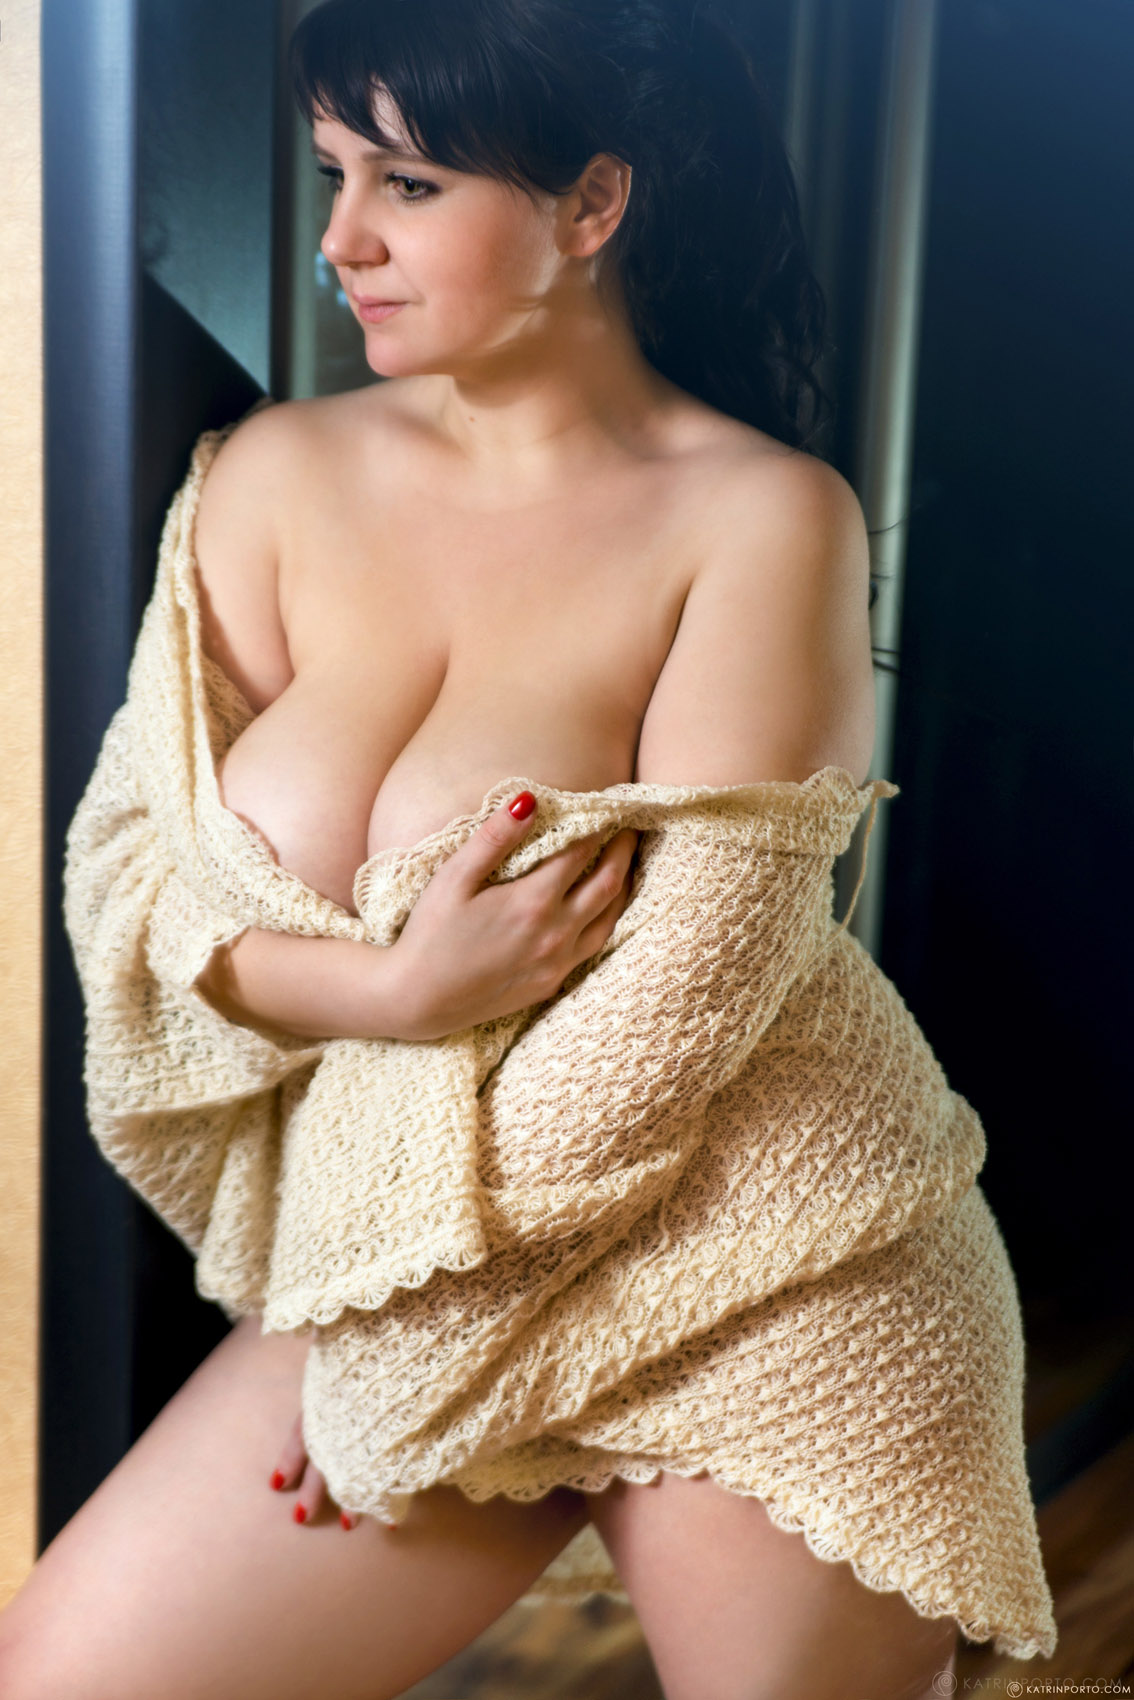 Katrin porto body massage with rimming and blowjob - 1 4